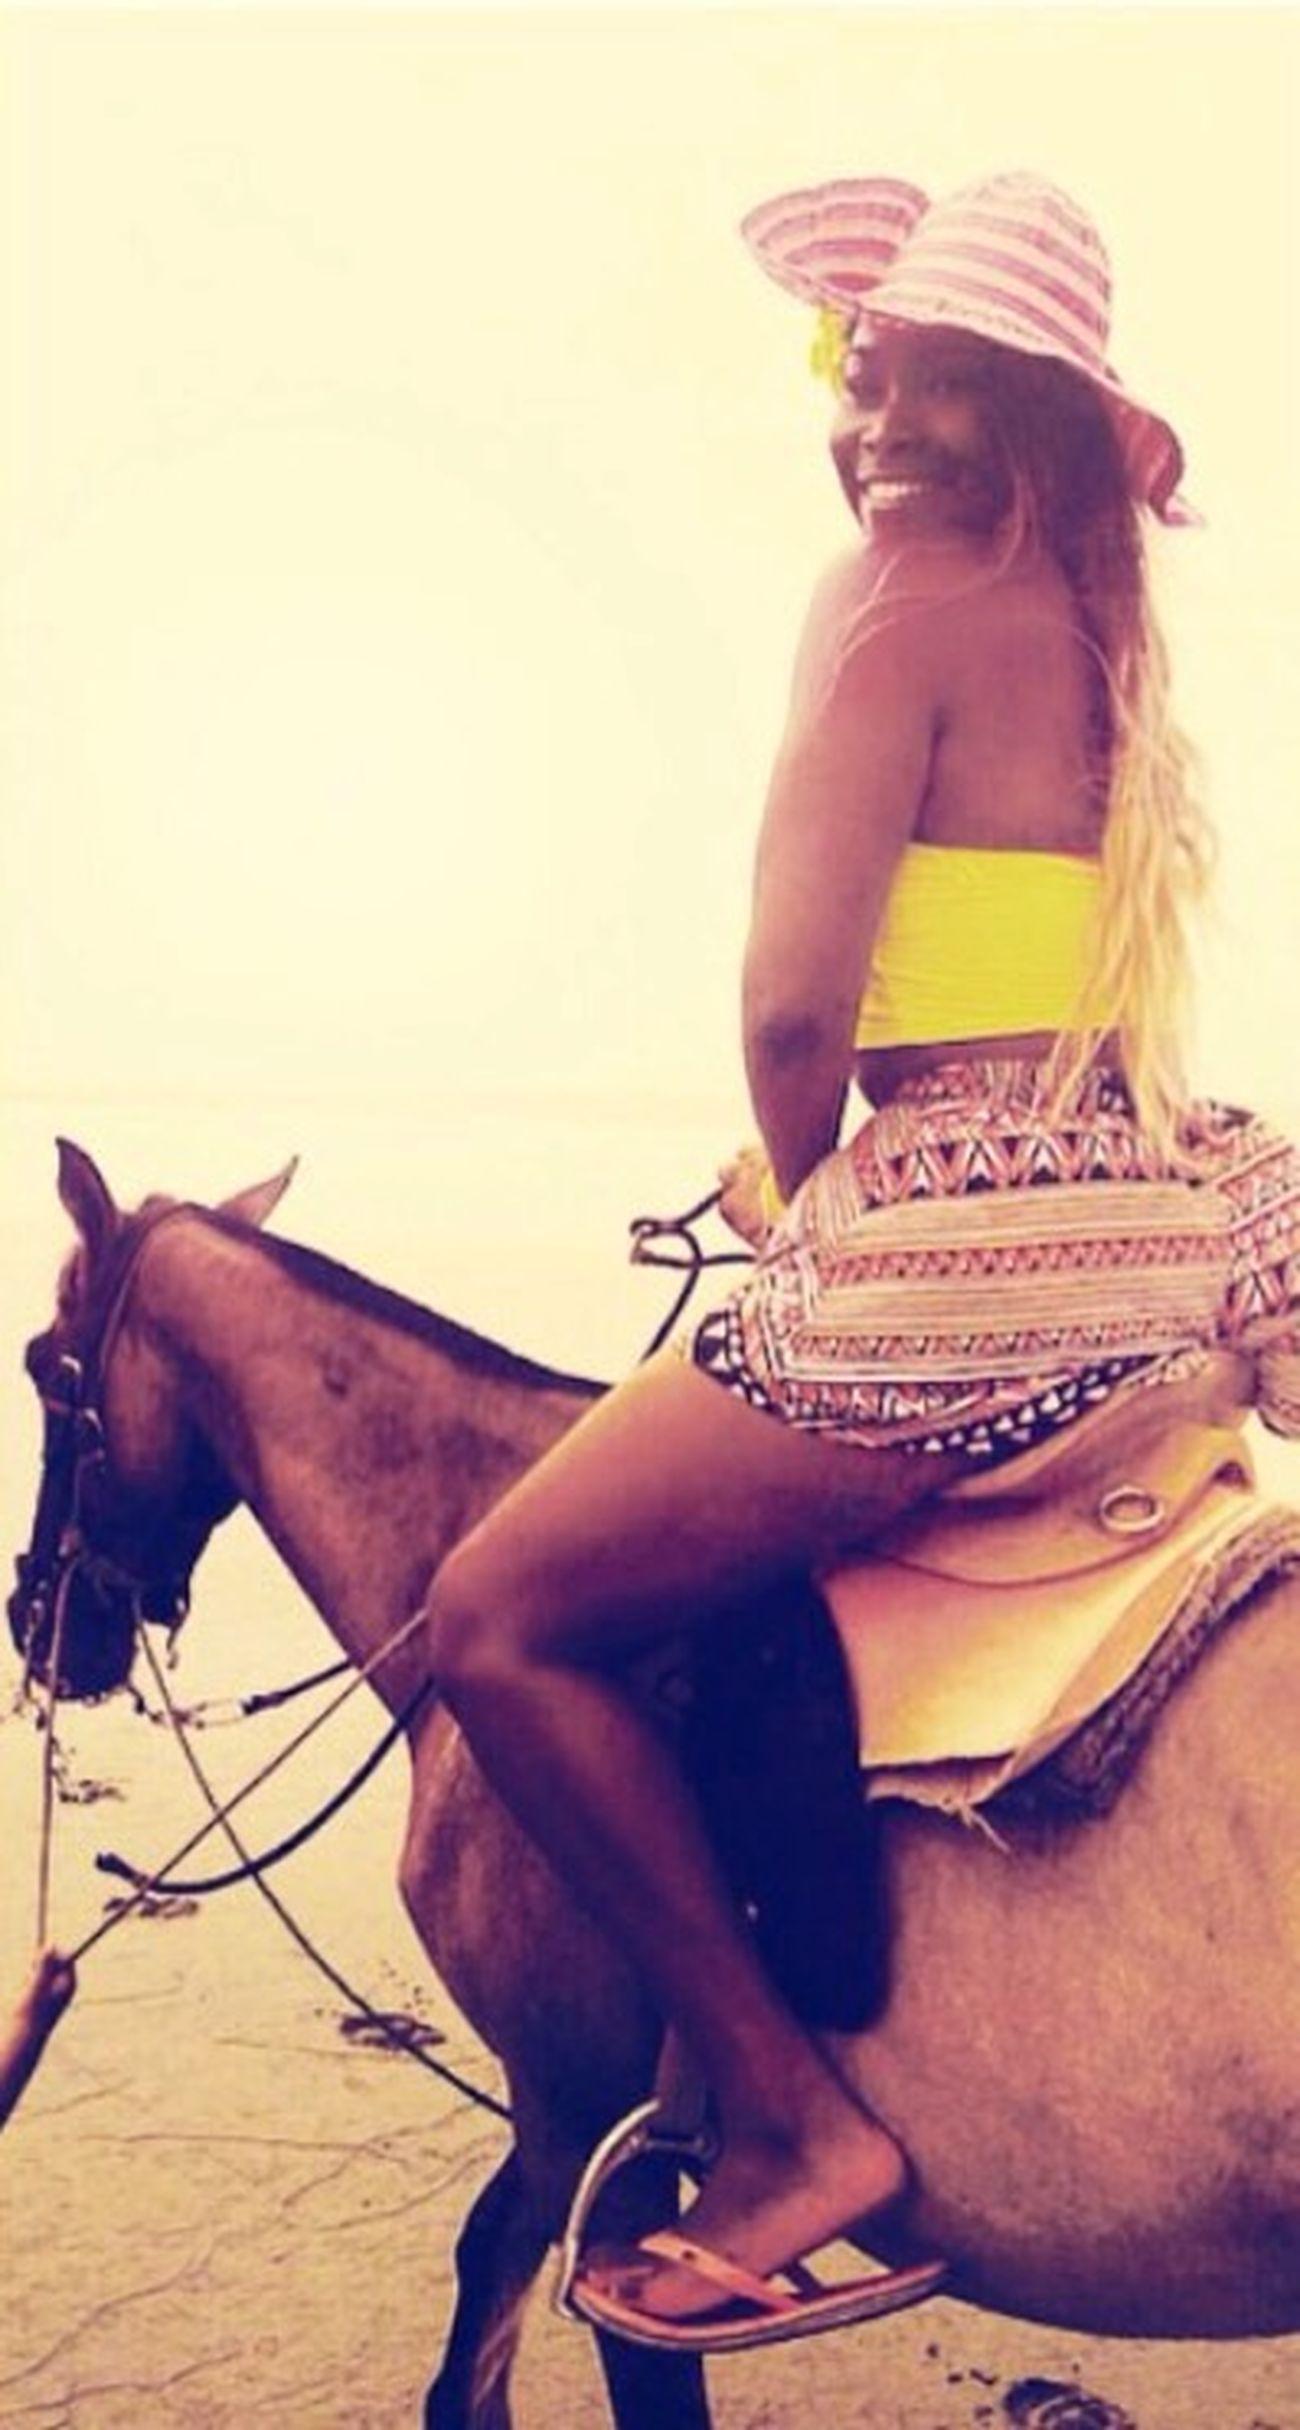 🐎🌸💗 Ecuador♥ That's Me Beach Love Horses! Caballos Mompiche Esmeraldas Decameron Smiling Always :)